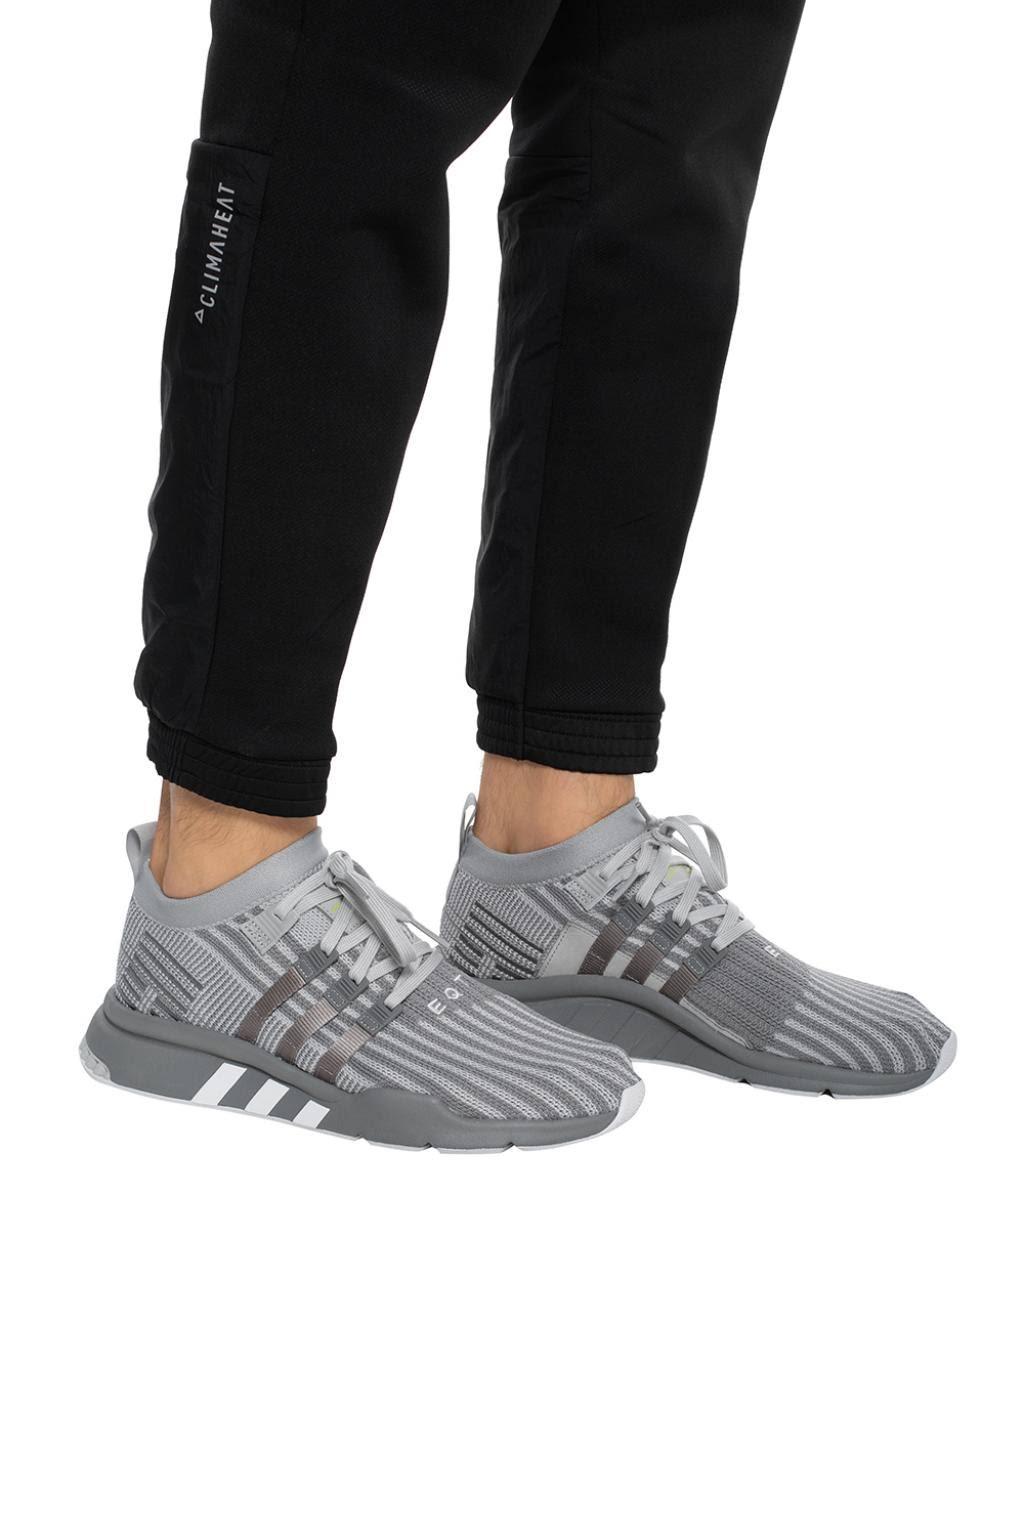 Adidas Adv 8 Two Grey Mid Eqt Support syello grethr Gretwo qTqFwp